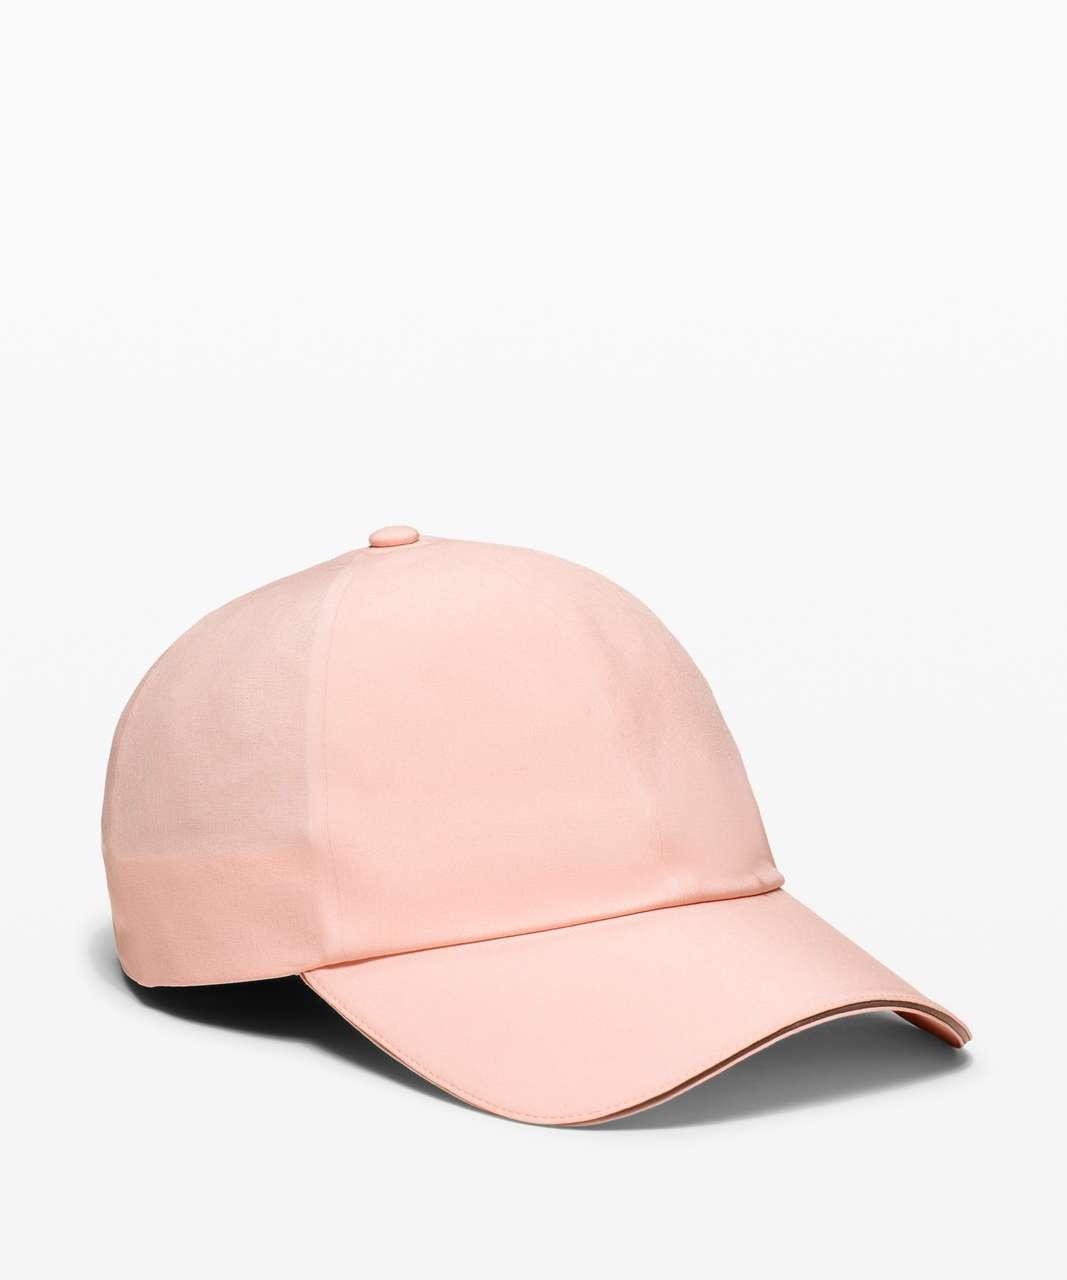 Lululemon Fast and Free Womens Run Hat - Pink Mist